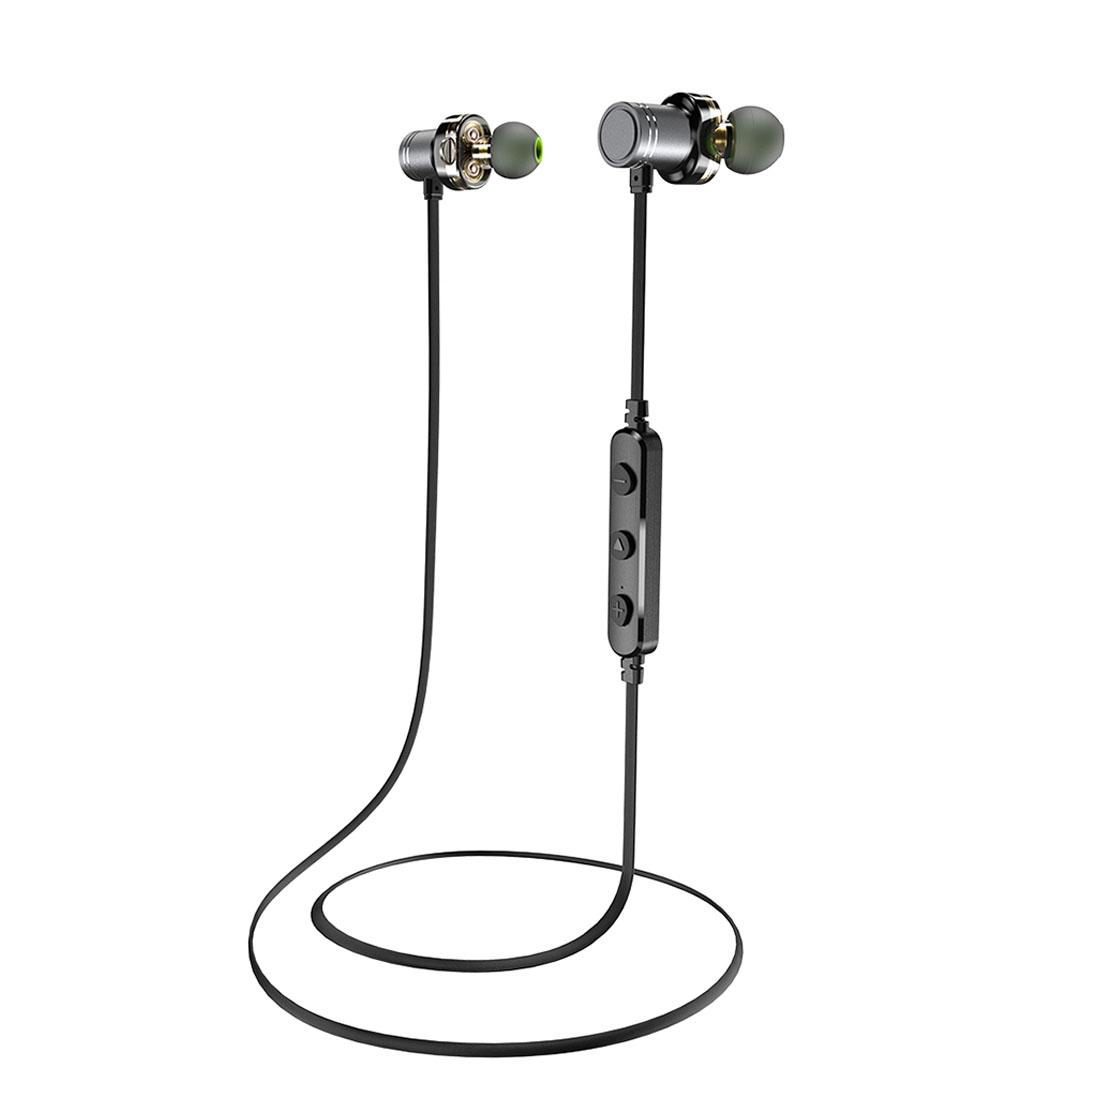 Awei X670bl Outdoor Sports Ipx4 Waterproof Anti Sweat Magnetic Fashion Stereo Bluetooth Earphone